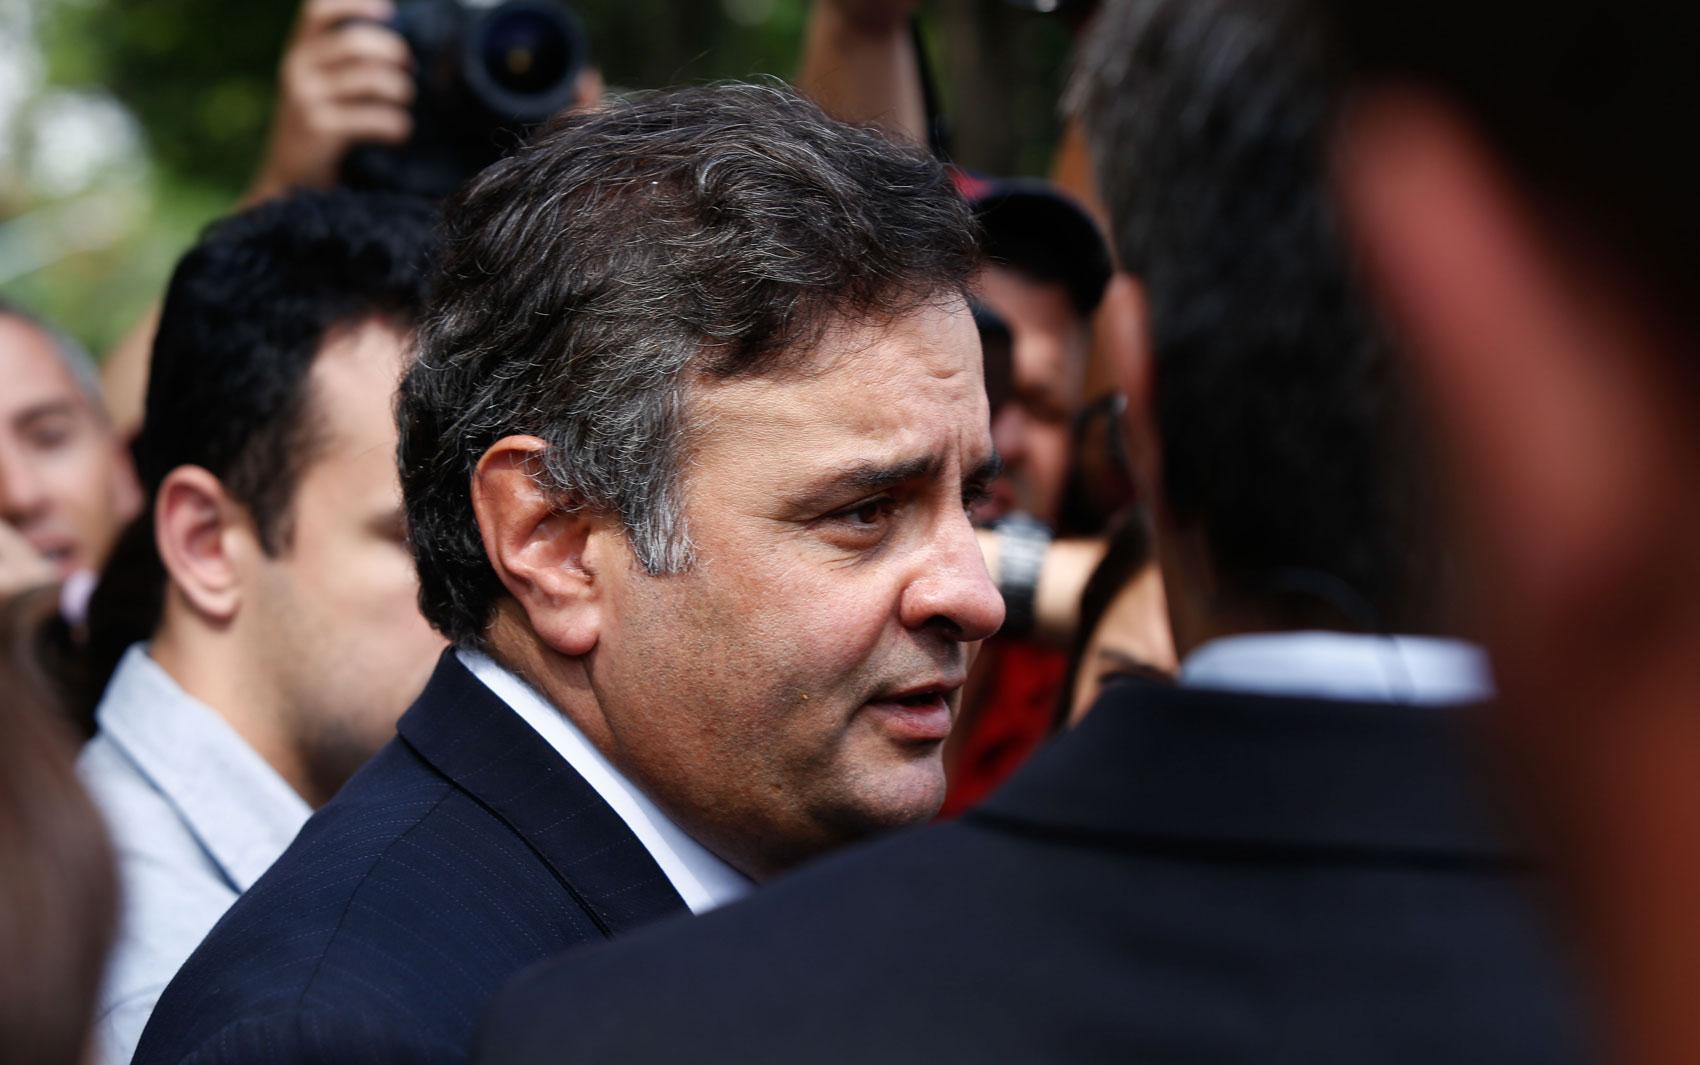 O presidente nacional do PSDB, senador Aécio Neves, esteve no velório de Thomaz Alckmin.